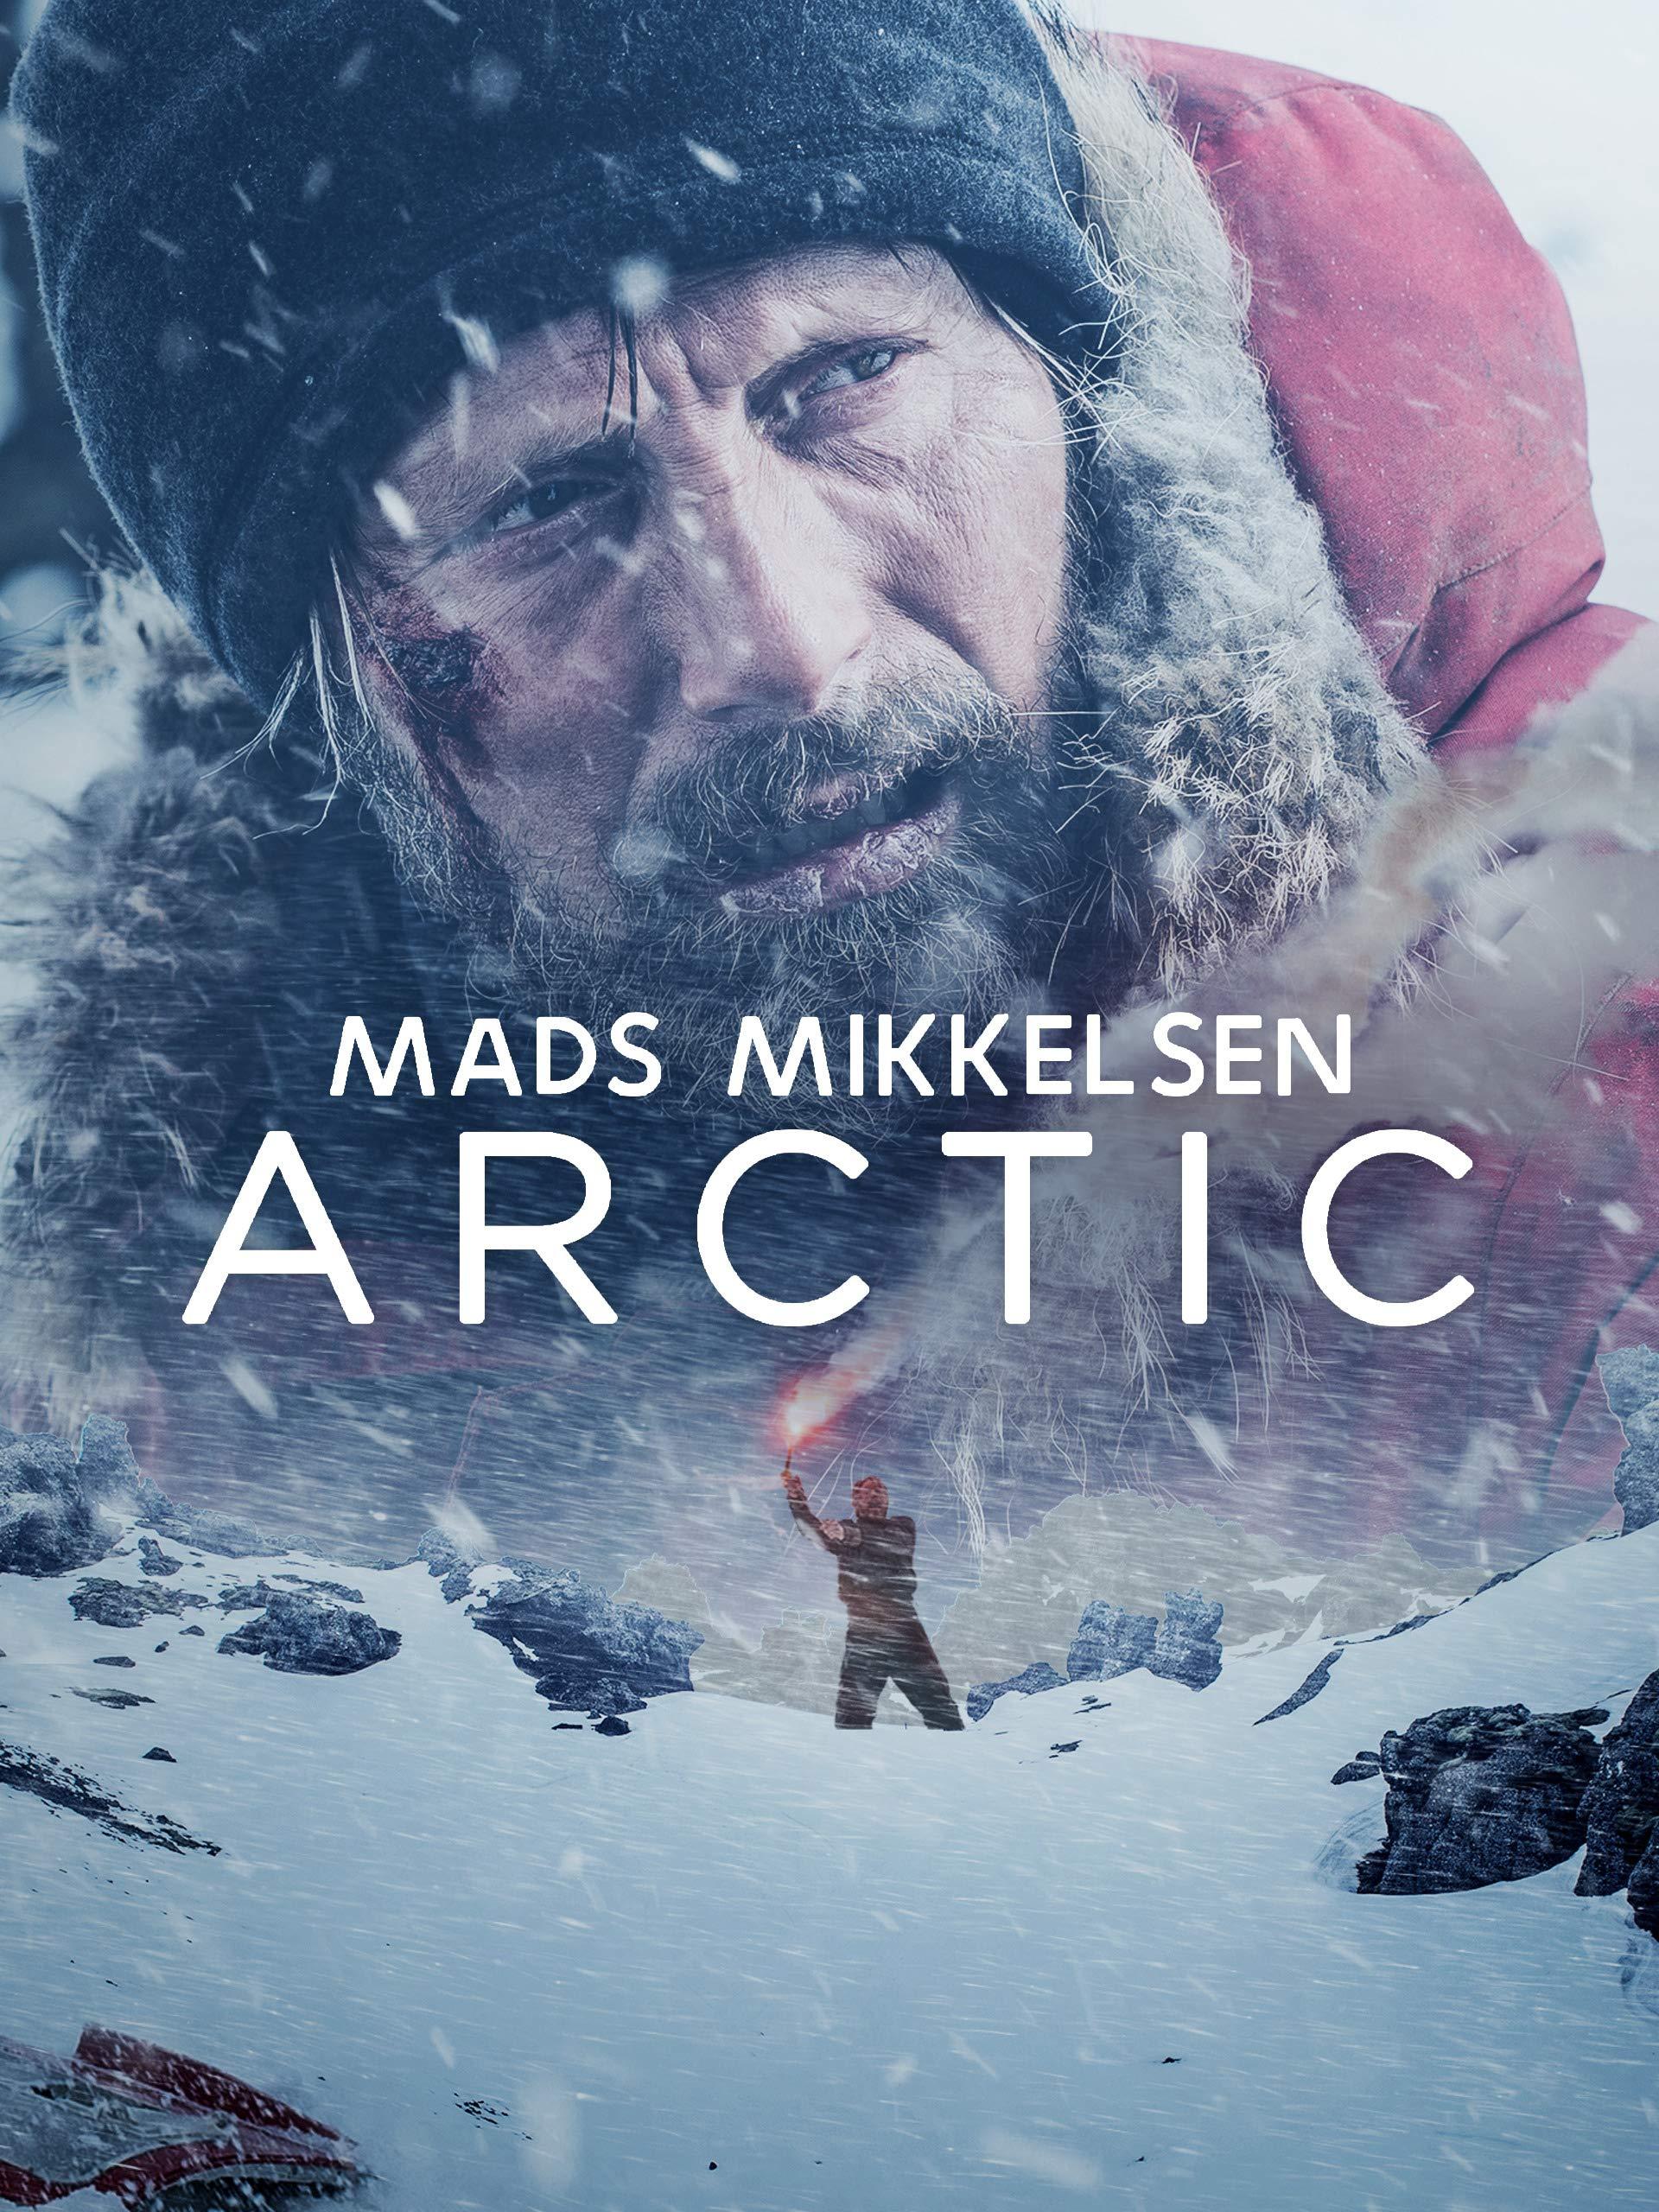 Arctic (2018) เกือบตายห่า [อย่าตาย]